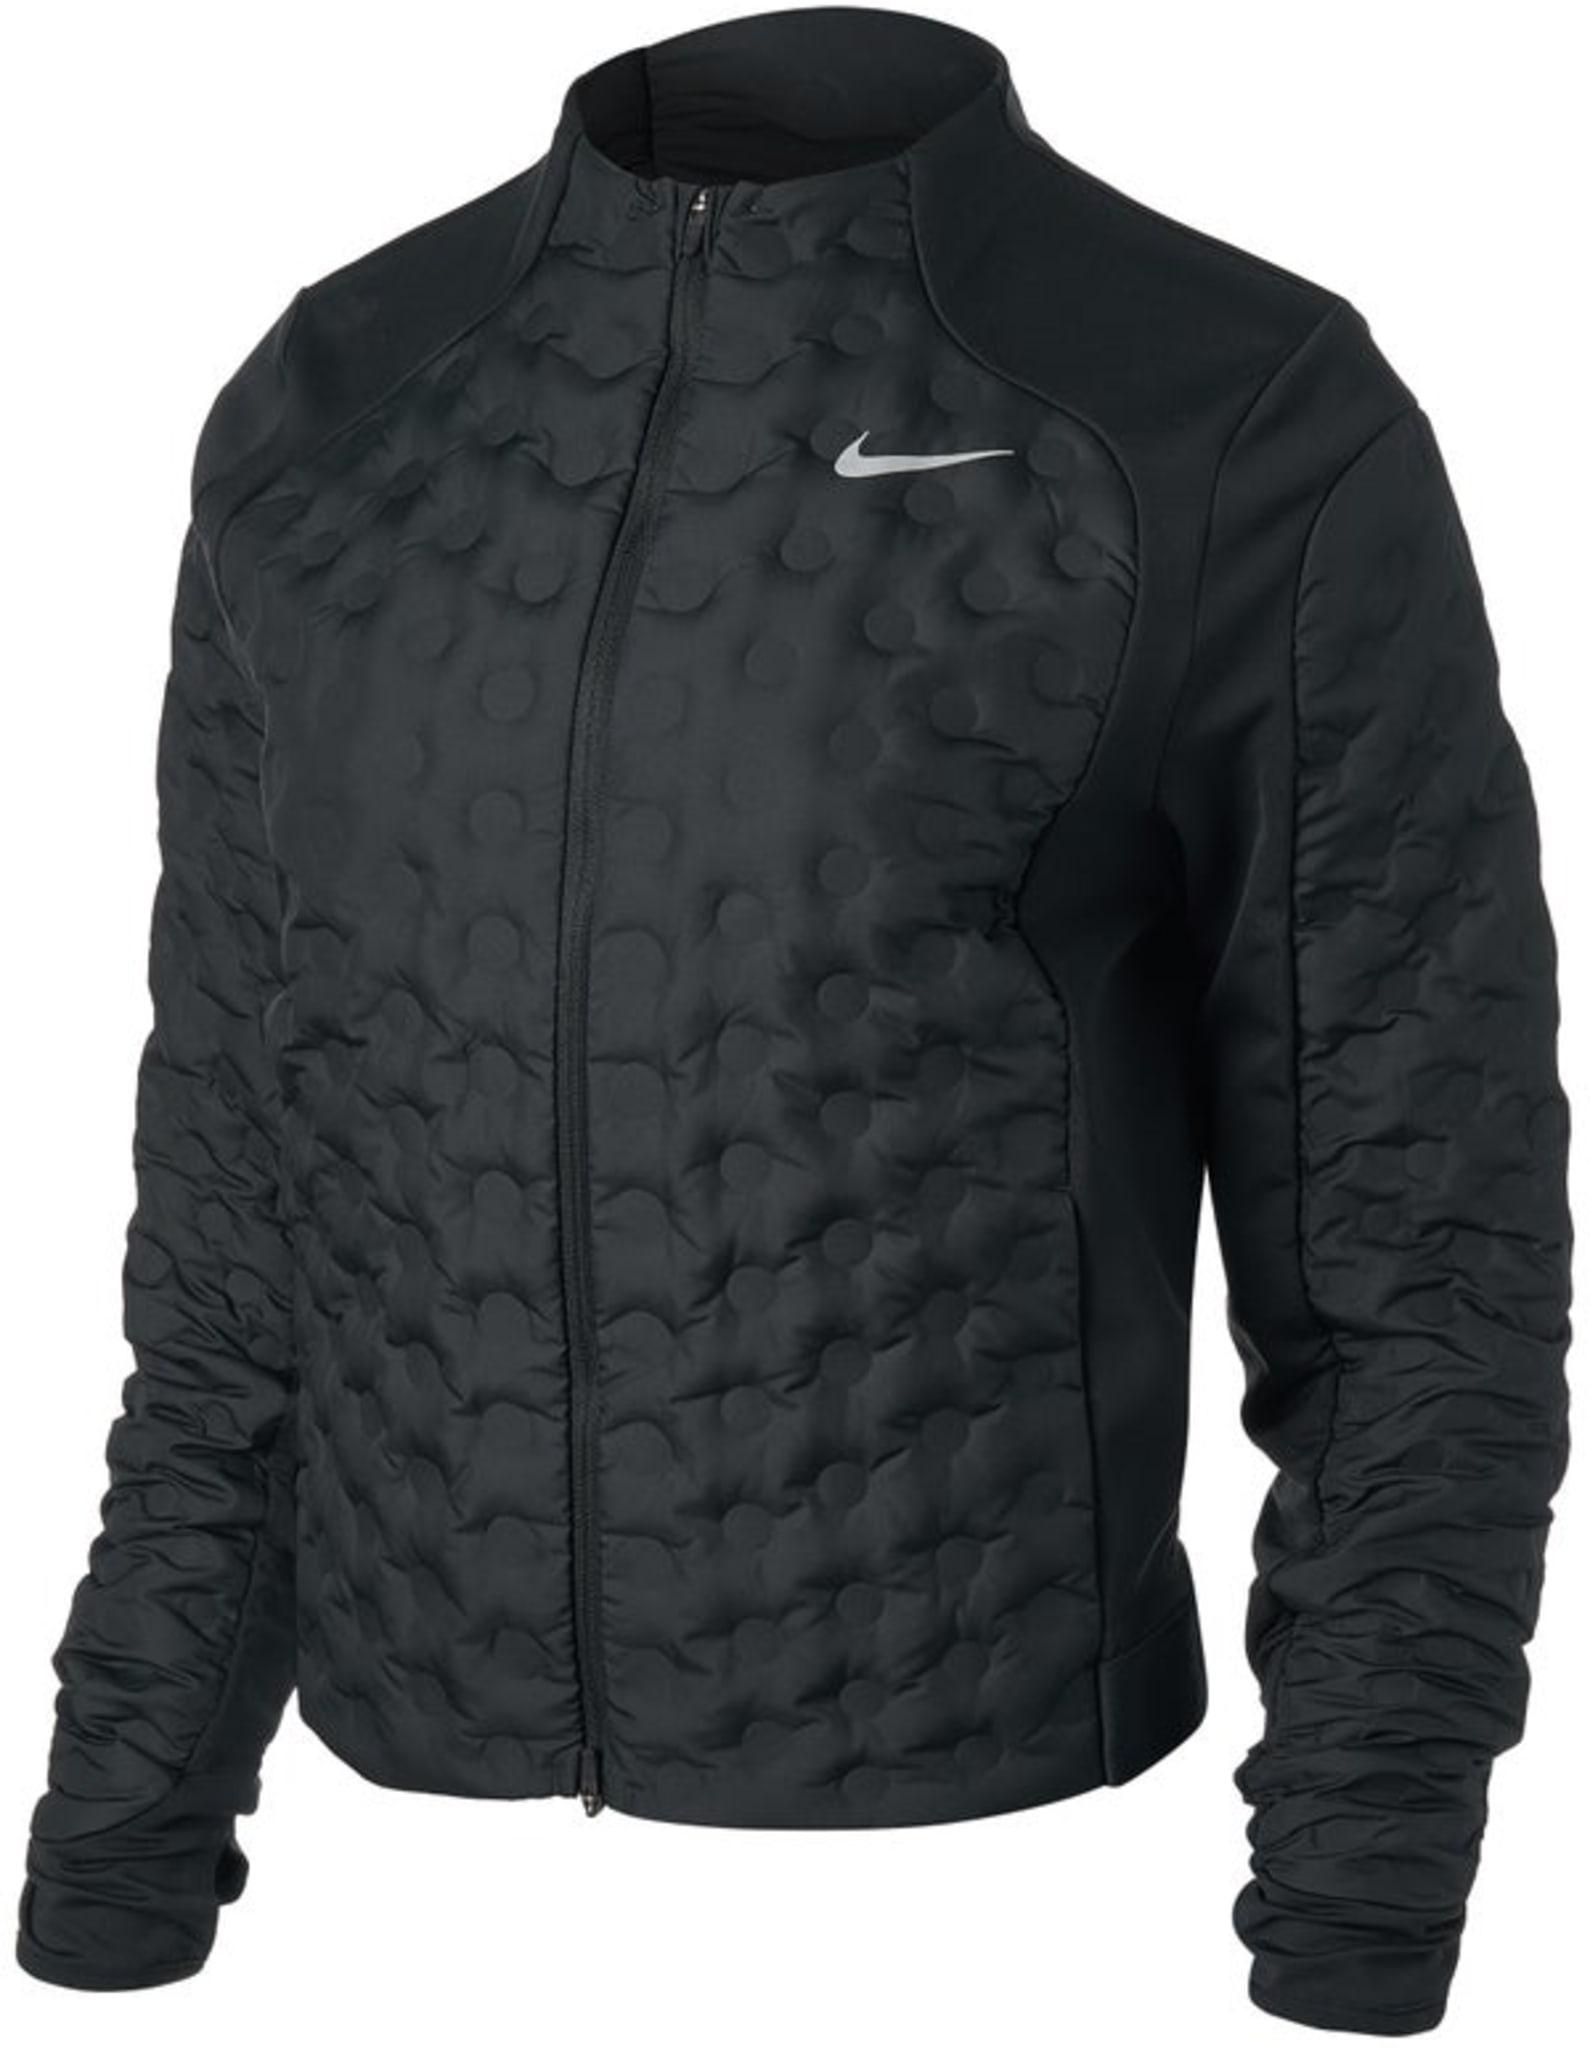 Aeroloft Women's Running Jacket